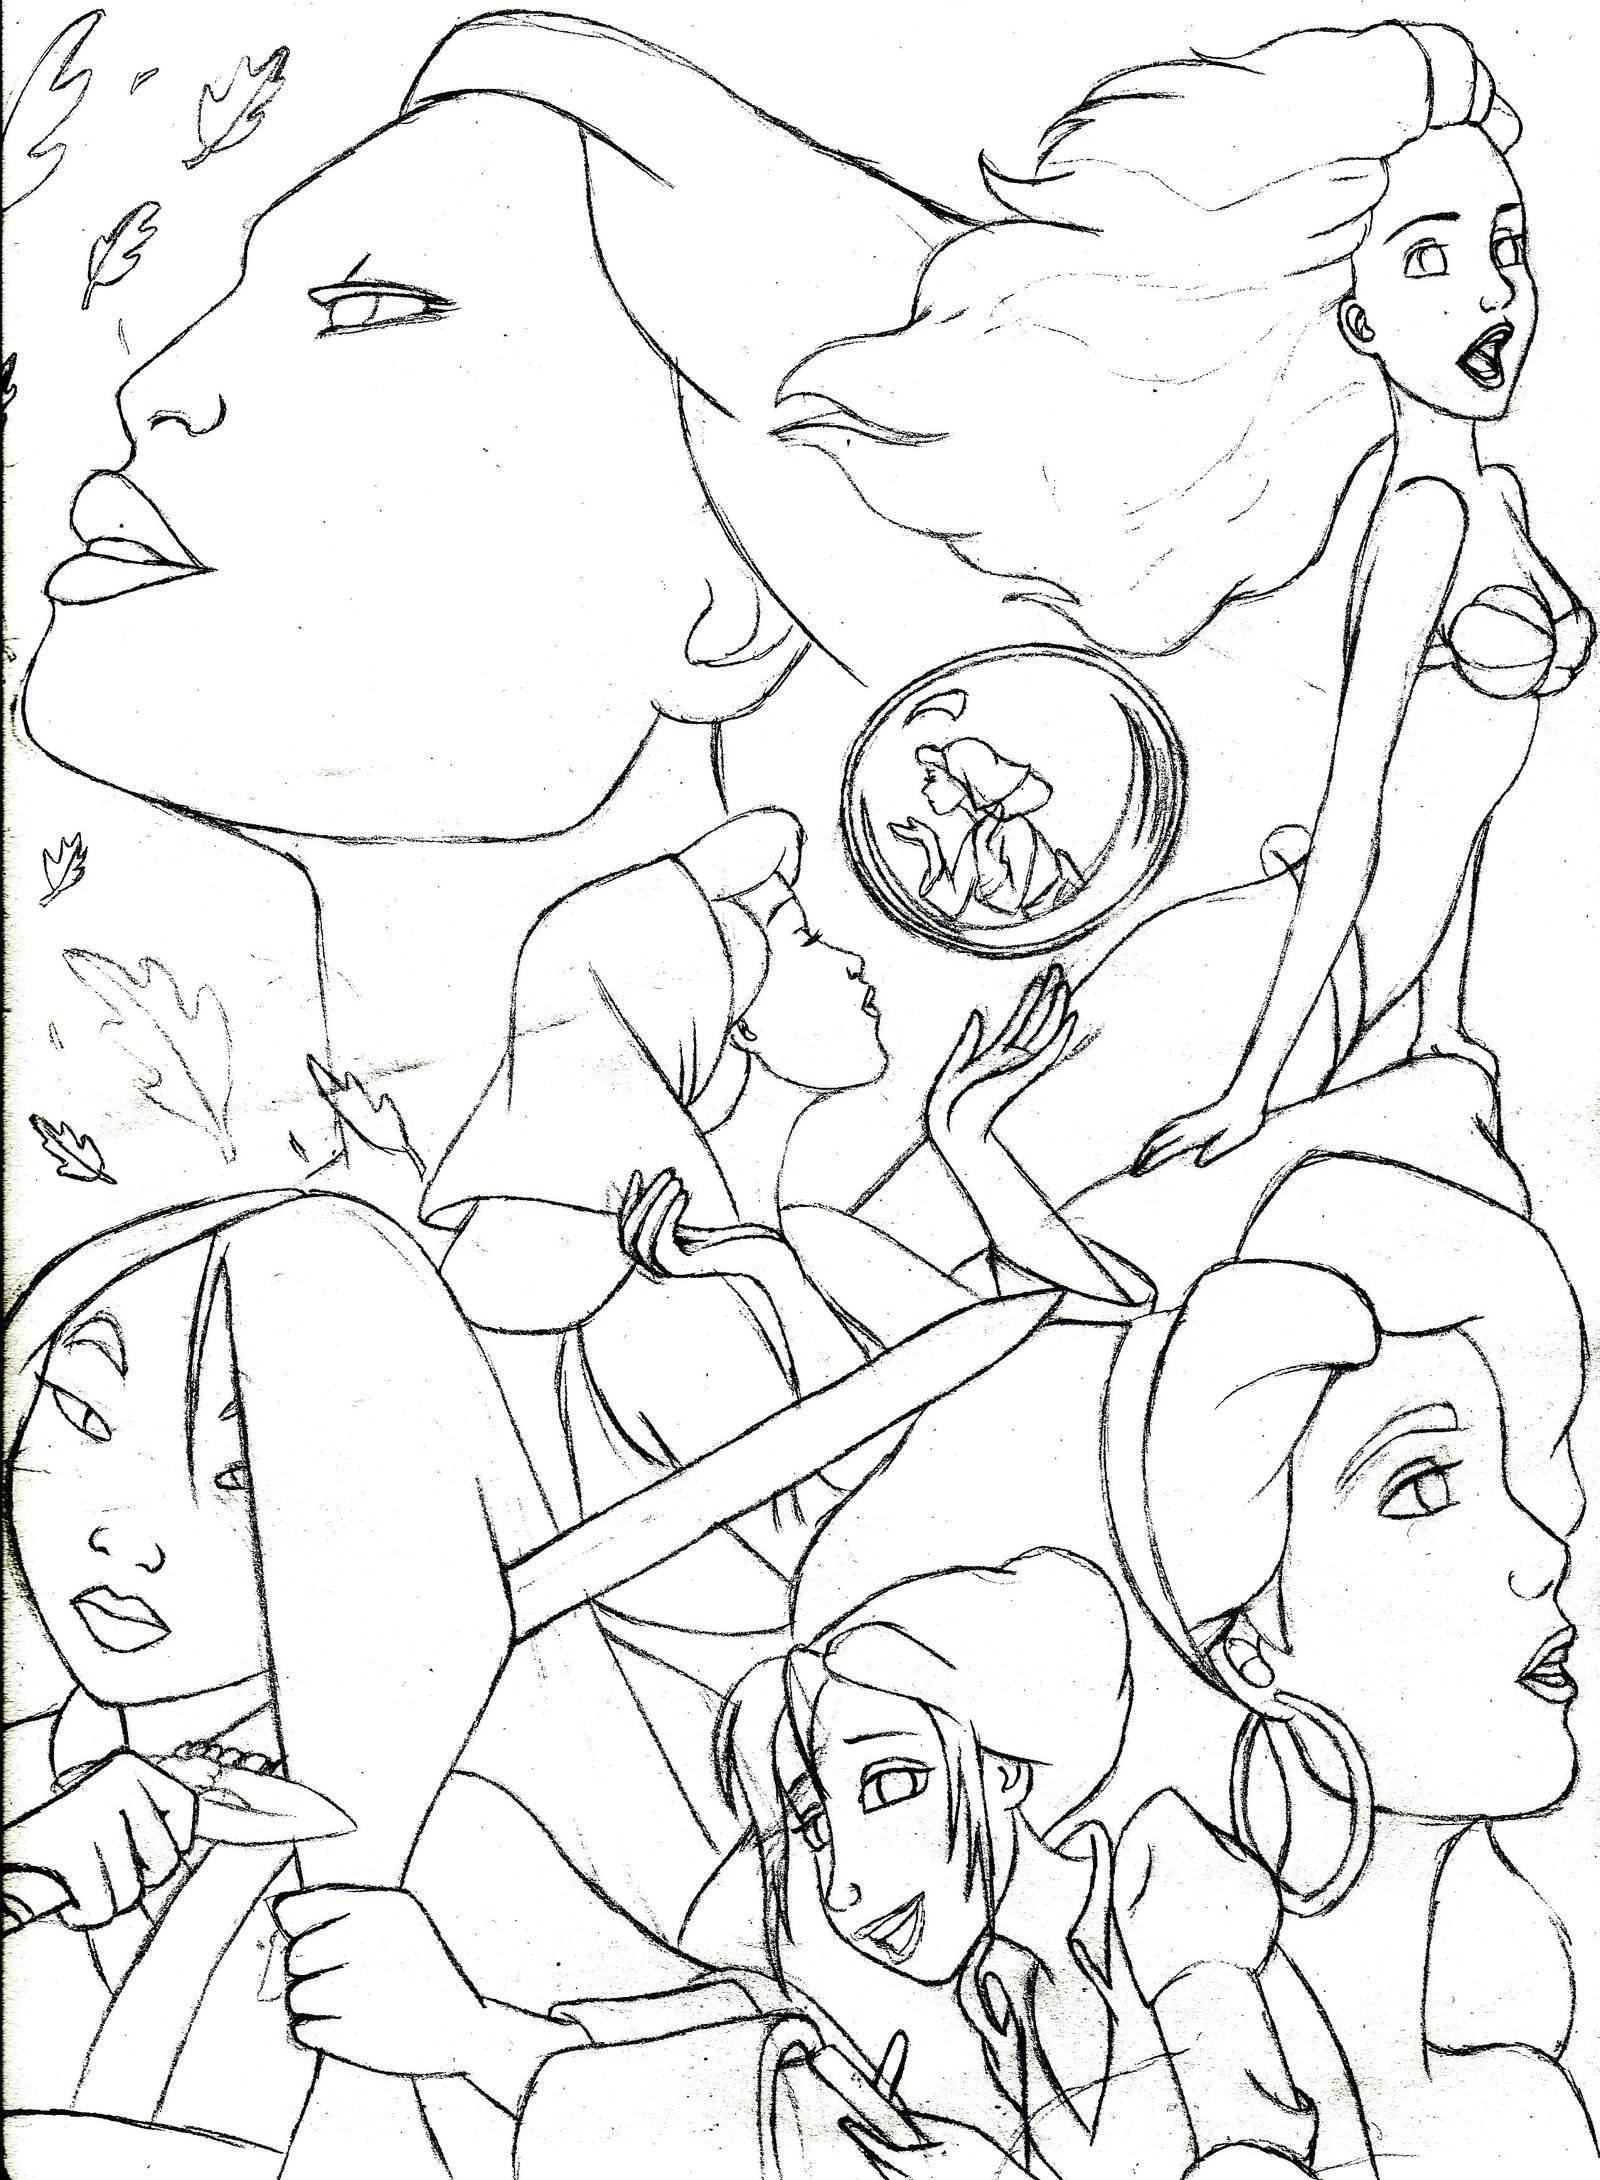 Line Art Disney : Disney poster line art by ras dragon on deviantart